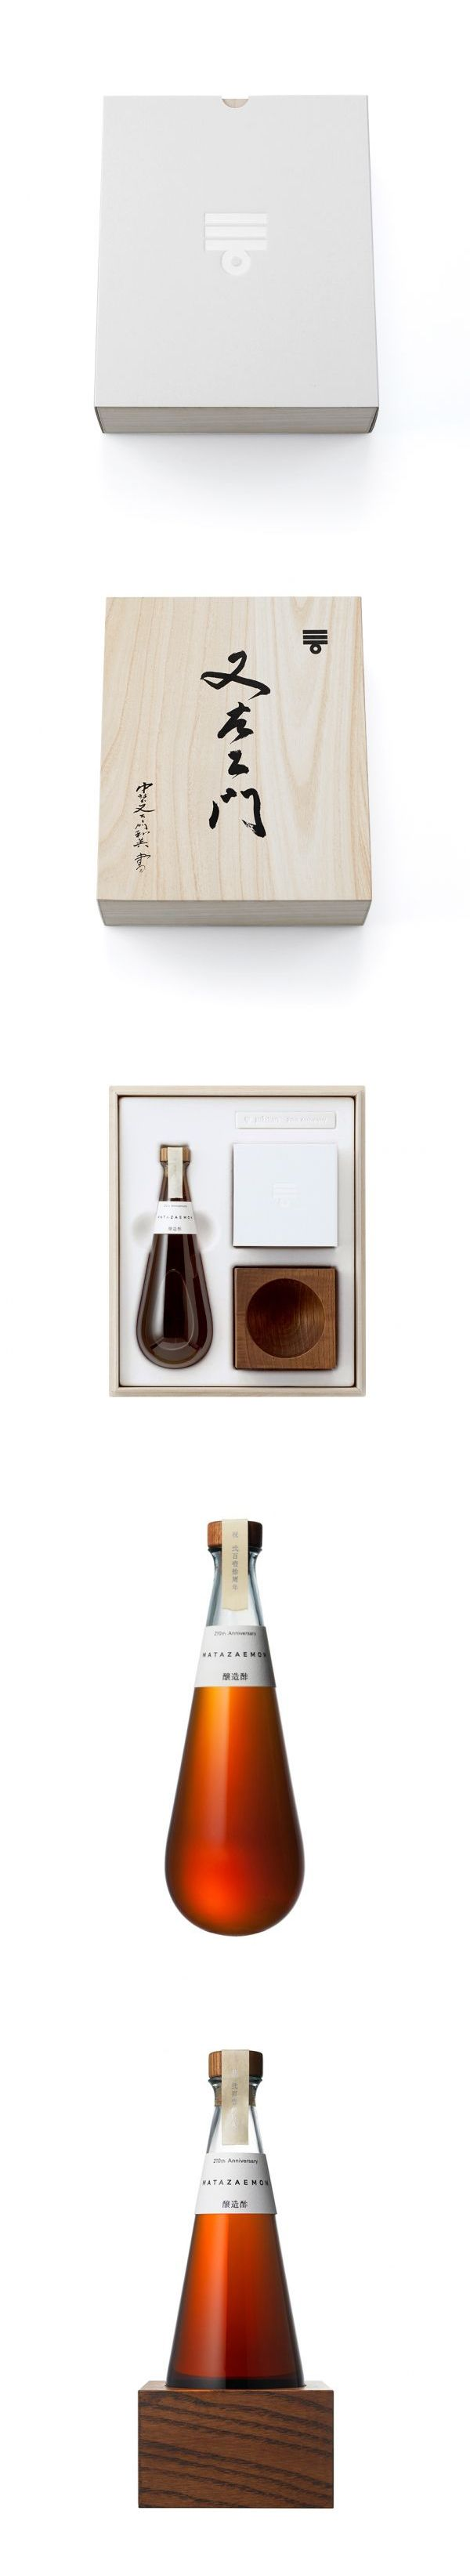 mizkan vinegar 210th anniversary packaging by taku satoh (佐藤卓)